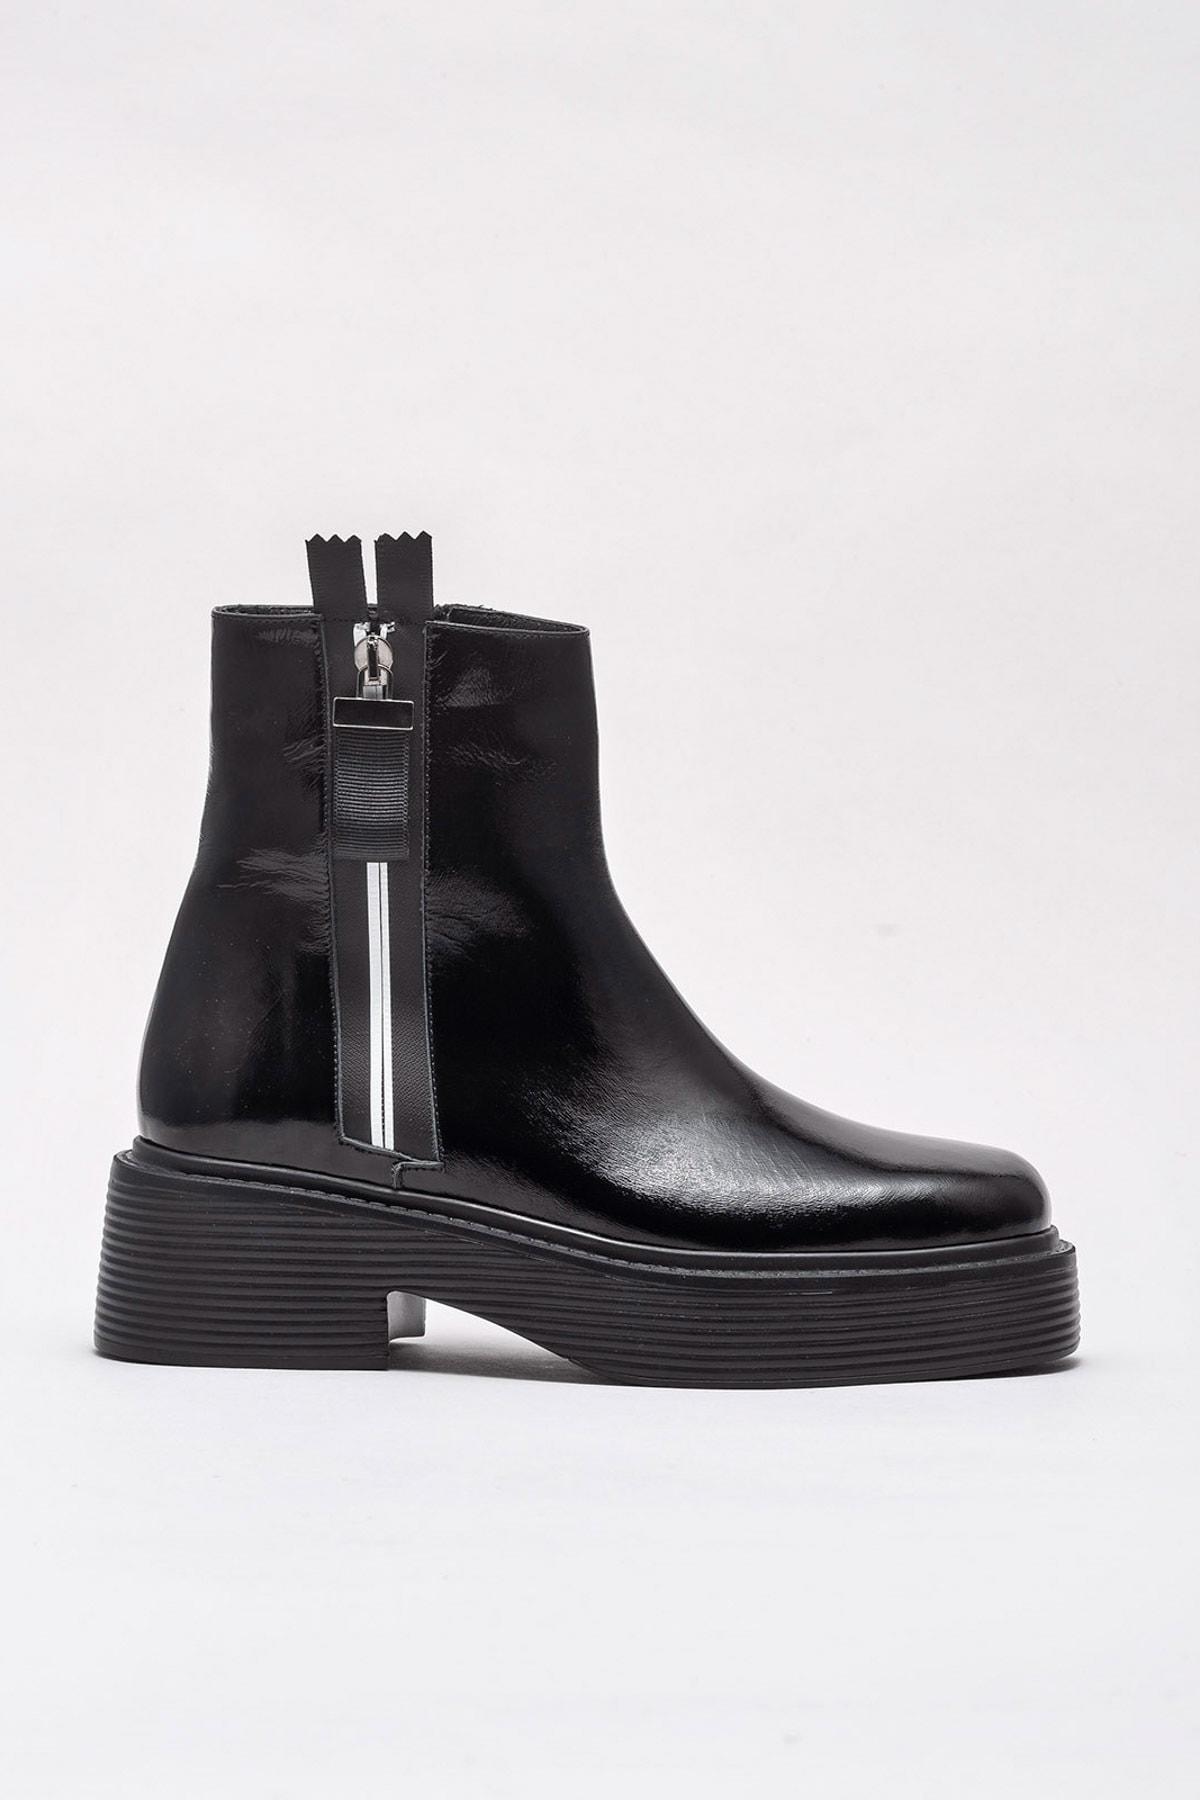 Elle Shoes Kadın Bot & Bootie Starla